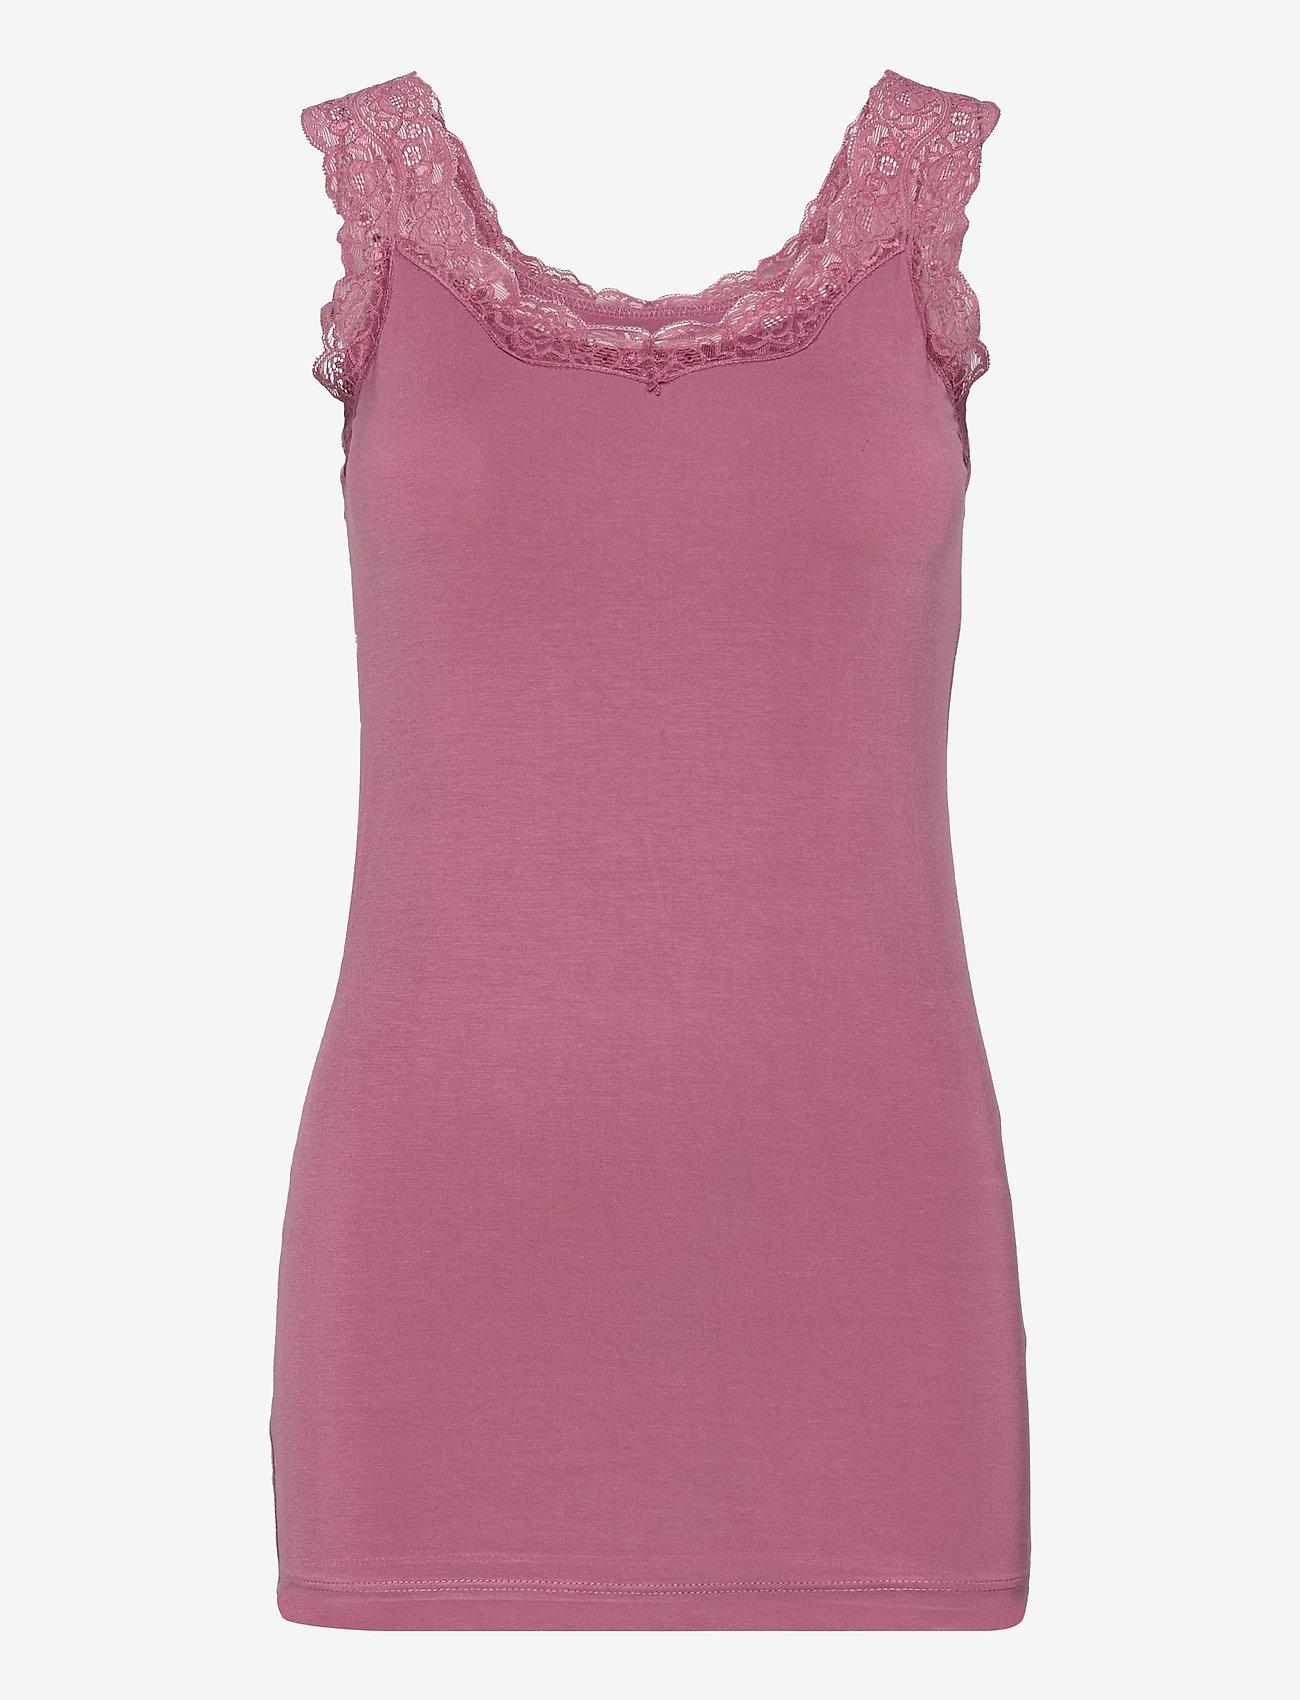 Soyaconcept - SC-MARICA - t-shirt & tops - dark pink rose - 0